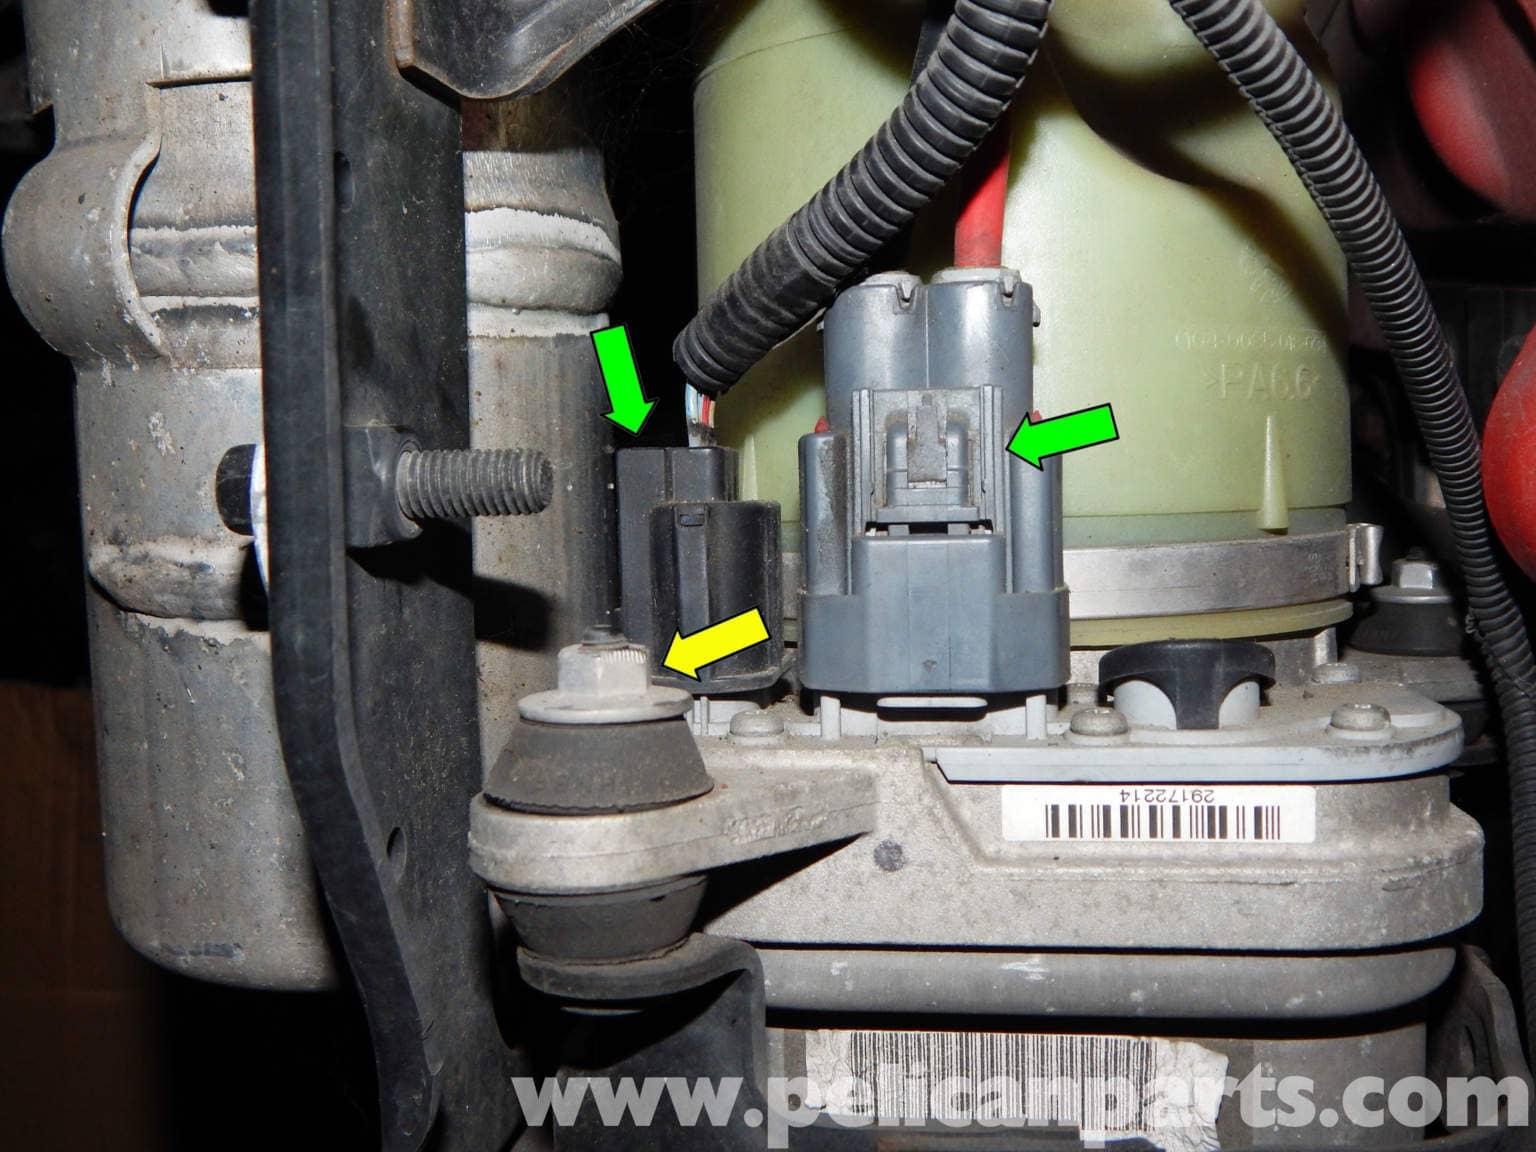 [TVPR_3874]  Volvo C30 Power Steering Pump Replacement | C30 T5 (2008-2013), C30 T5  R-Design (2008-2013) | Pelican Parts DIY Maintenance Article | Volvo Power Steering Pump Wiring Diagram |  | Pelican Parts